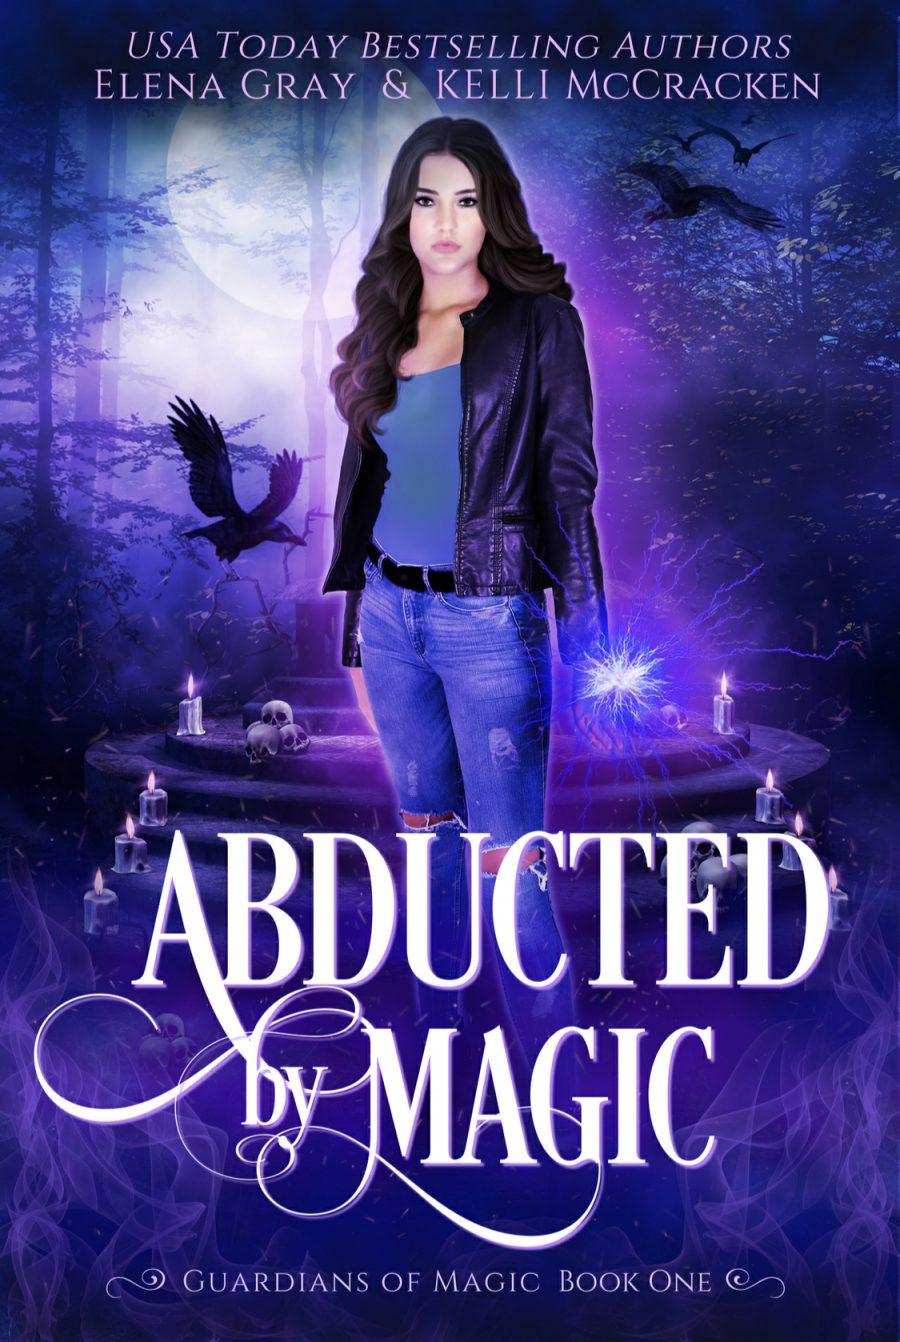 Abducted by Magic by Elena Gray & Kelli McCracken - A Book Review #BookReview #PNR #SlowBurn #RH #ReverseHarem #WhyChoose #KU